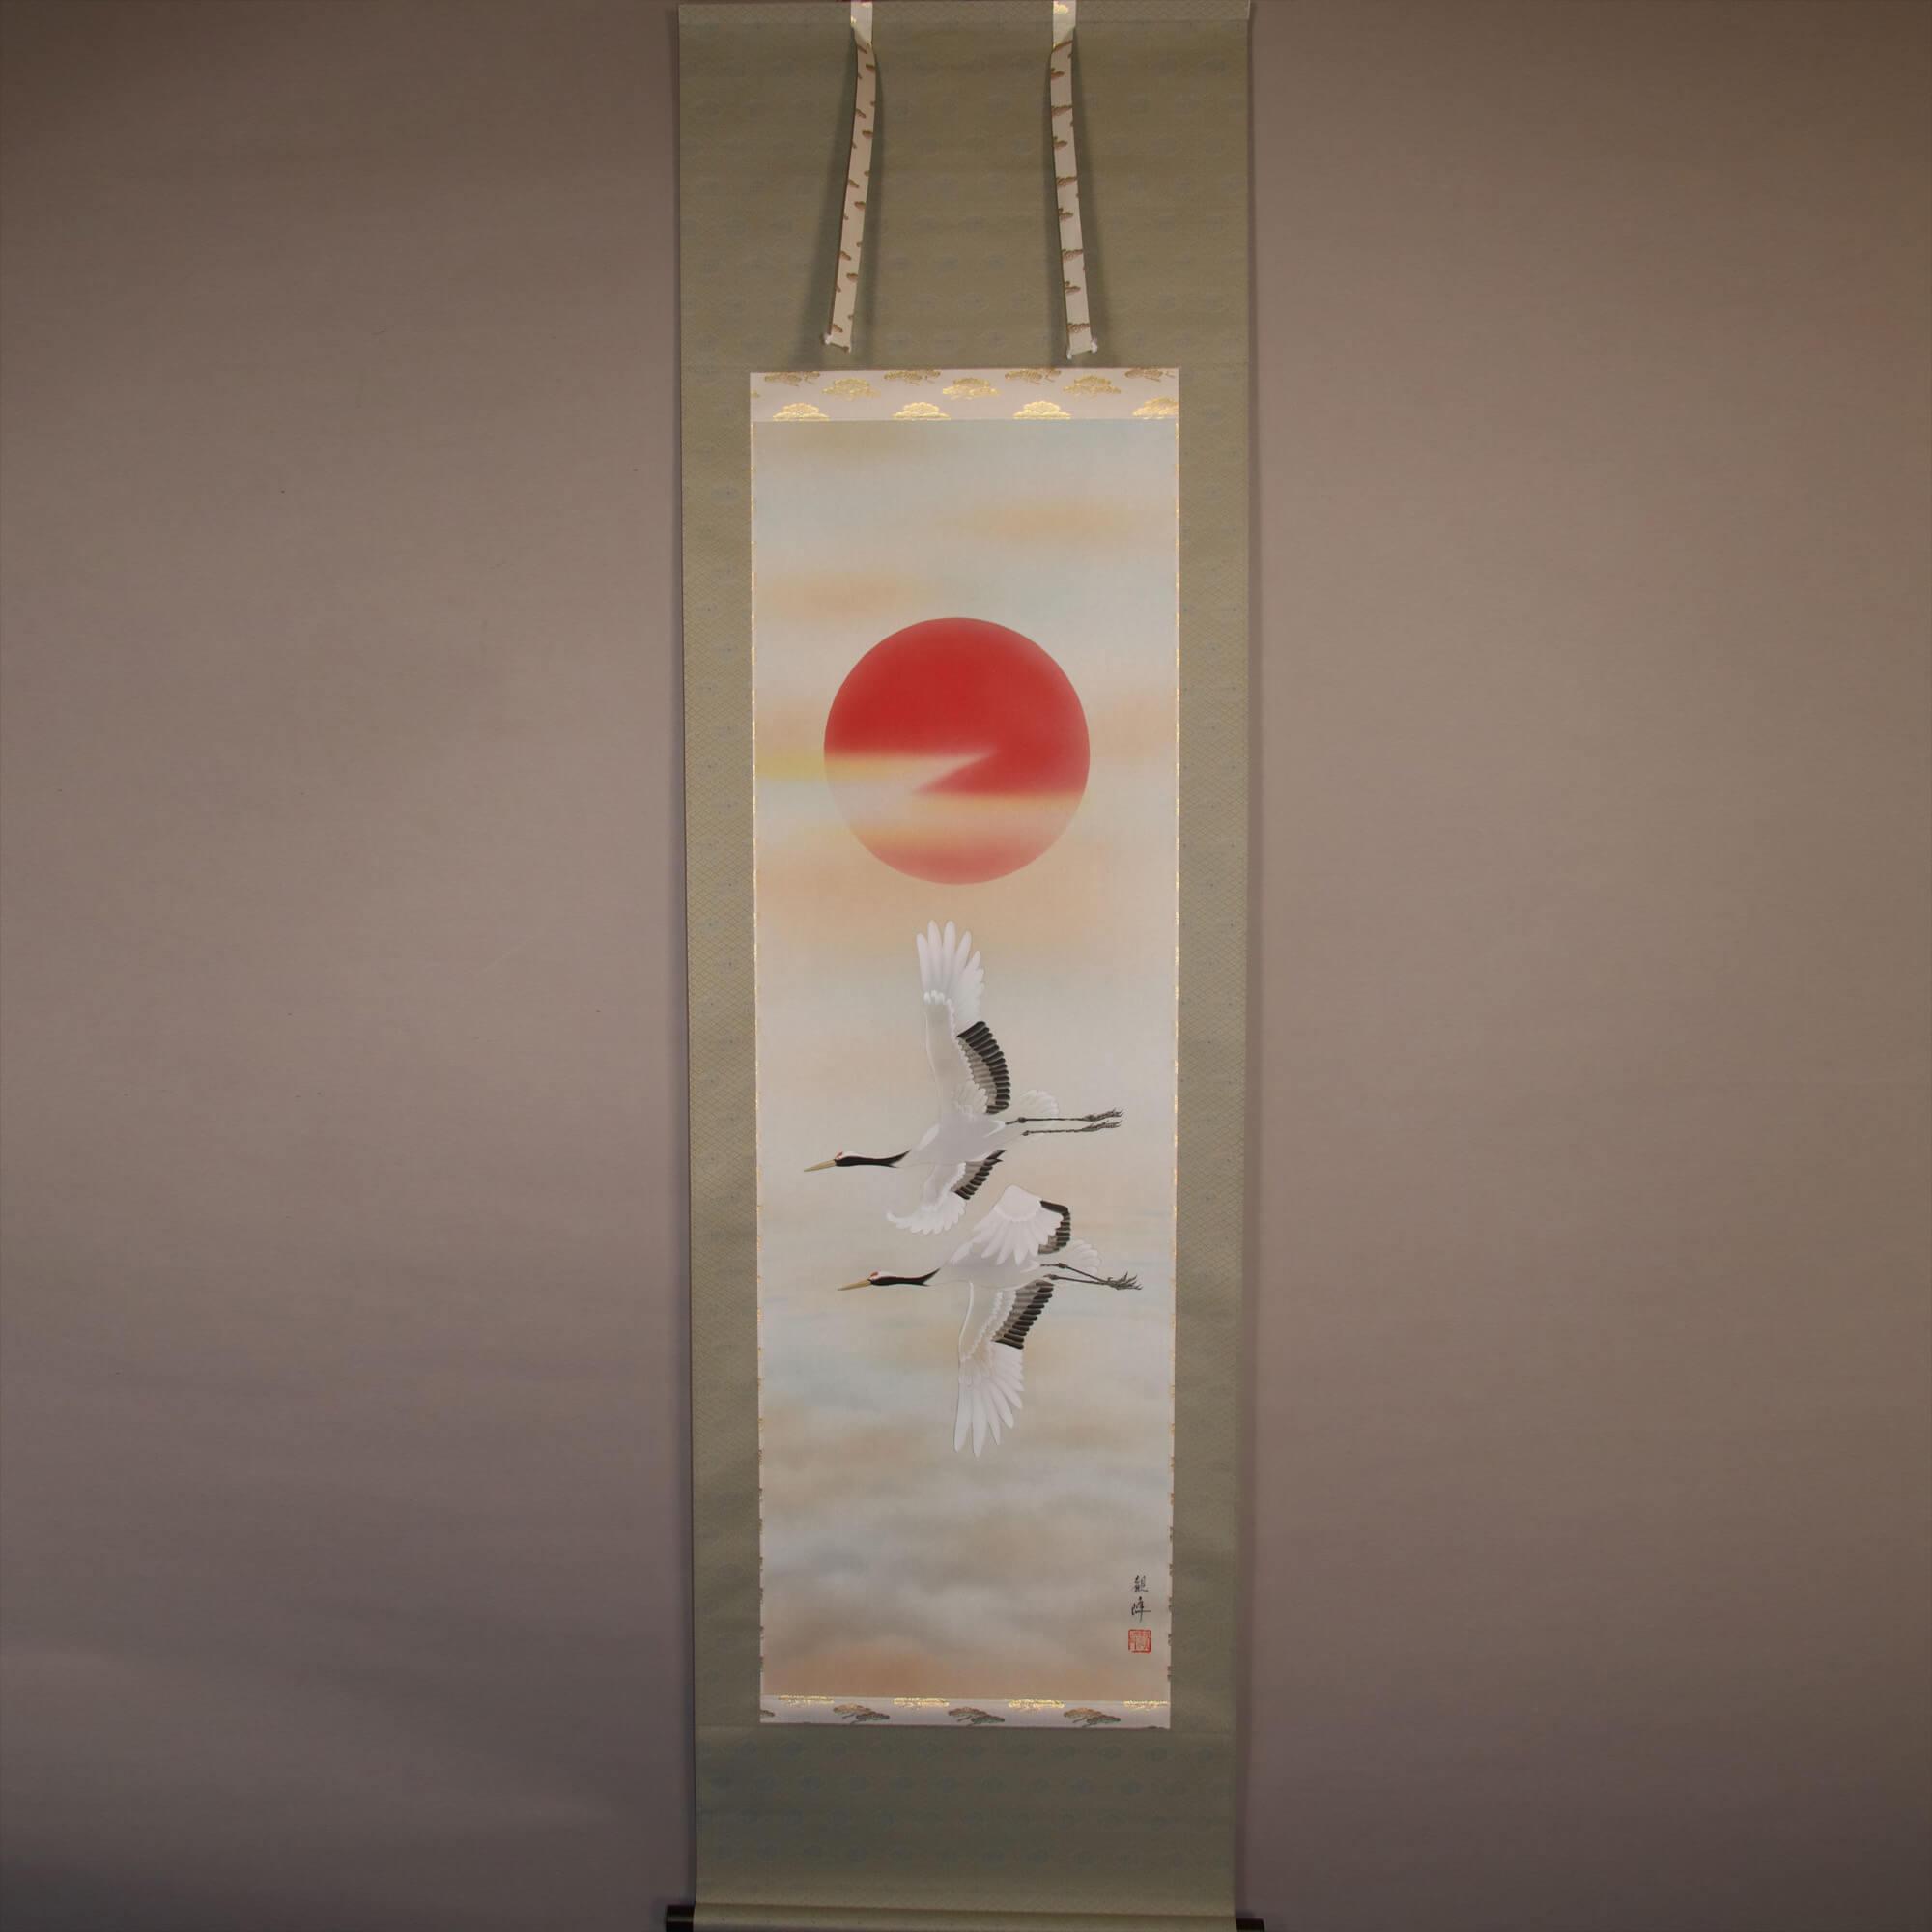 Rising Sun and Cranes in Flight / Kawamura Kanpō